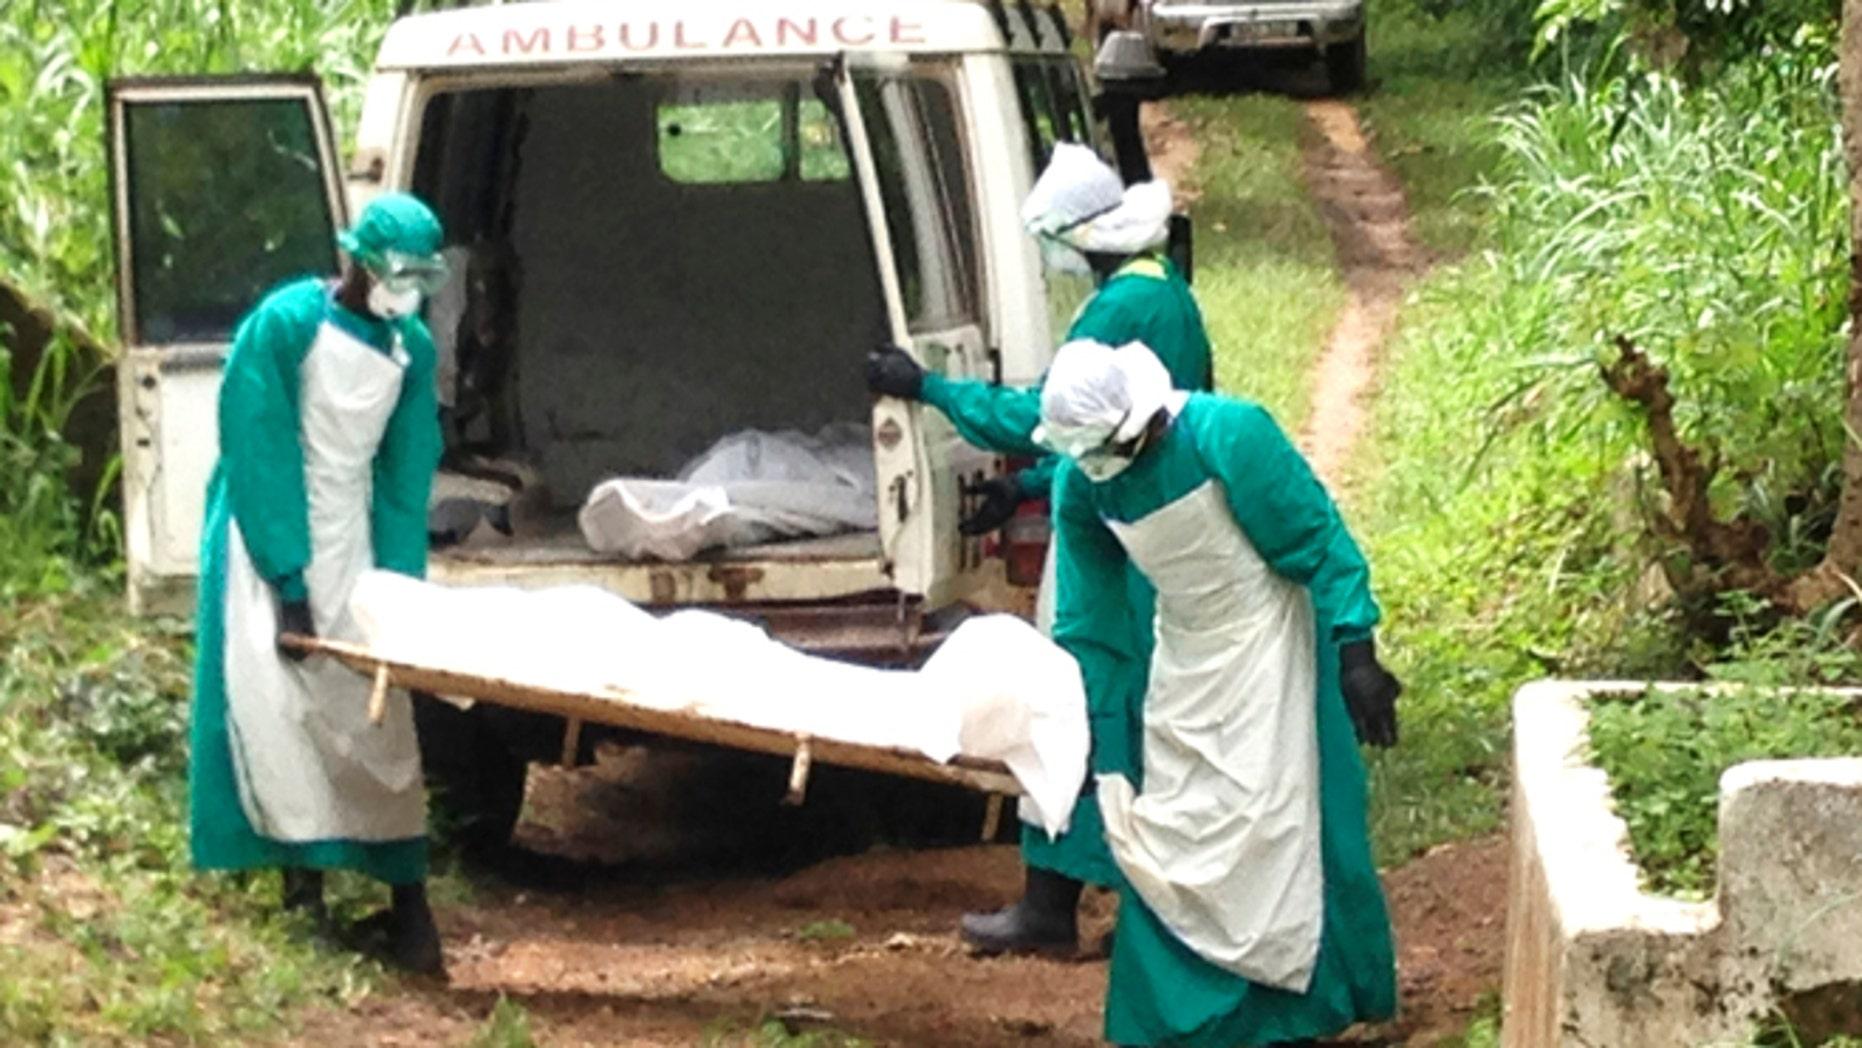 Health workers carry the body of an Ebola virus victim in Kenema, Sierra Leone, June 25, 2014. Picture taken June 25, 2014. REUTERS/Umaru Fofana